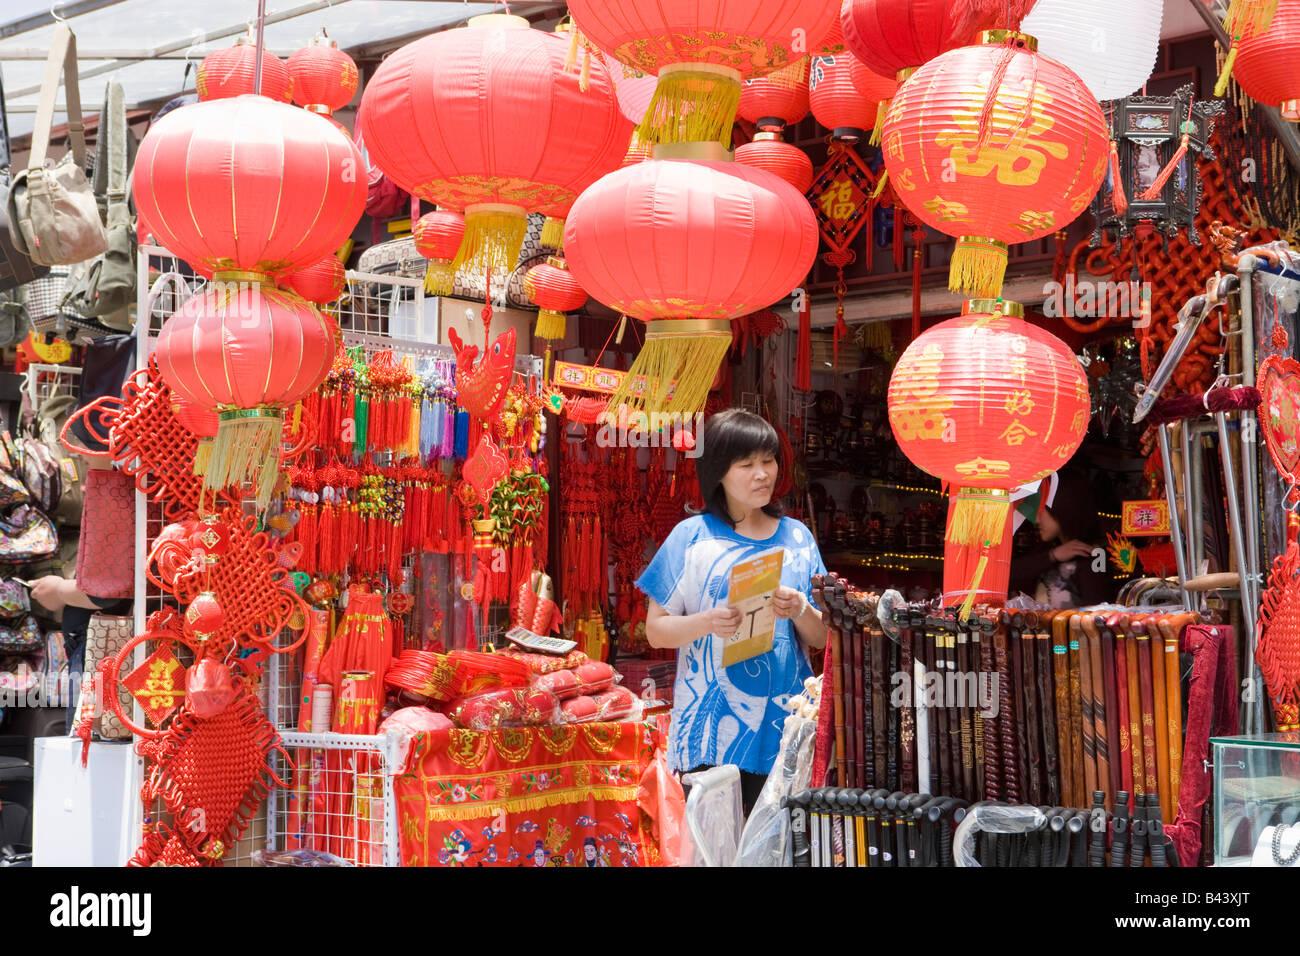 China Shanghai Chinese lantern shop Nanjing Road - Stock Image